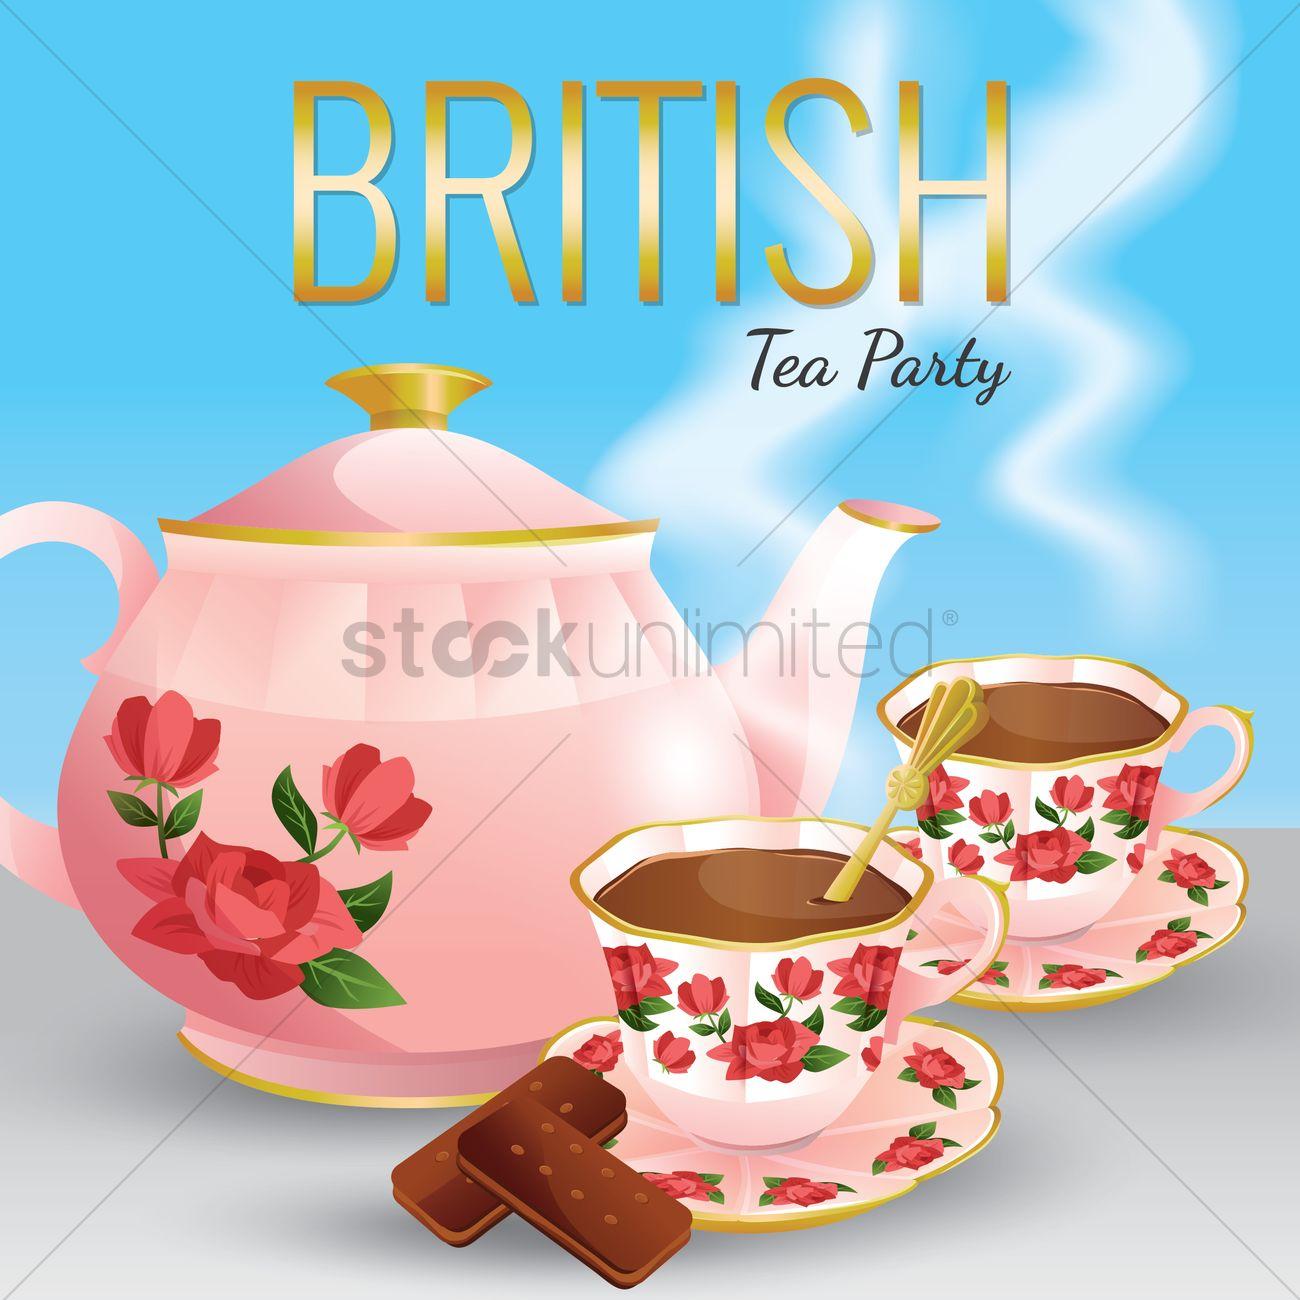 1300x1300 British Tea Party Vector Image